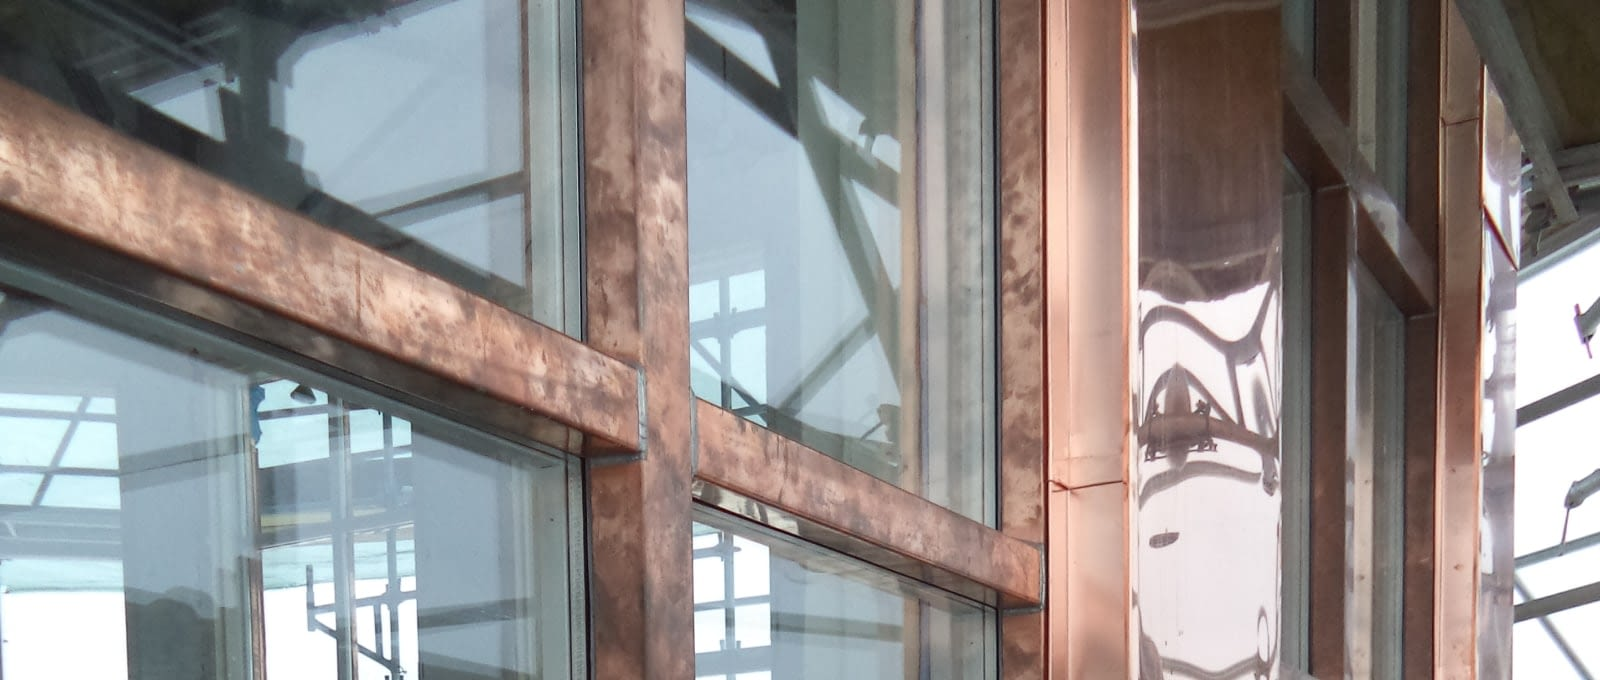 Window and door restoration - Close-up of metal clad window restoration at St.Augustine's Seminary in Toronto, Ontario